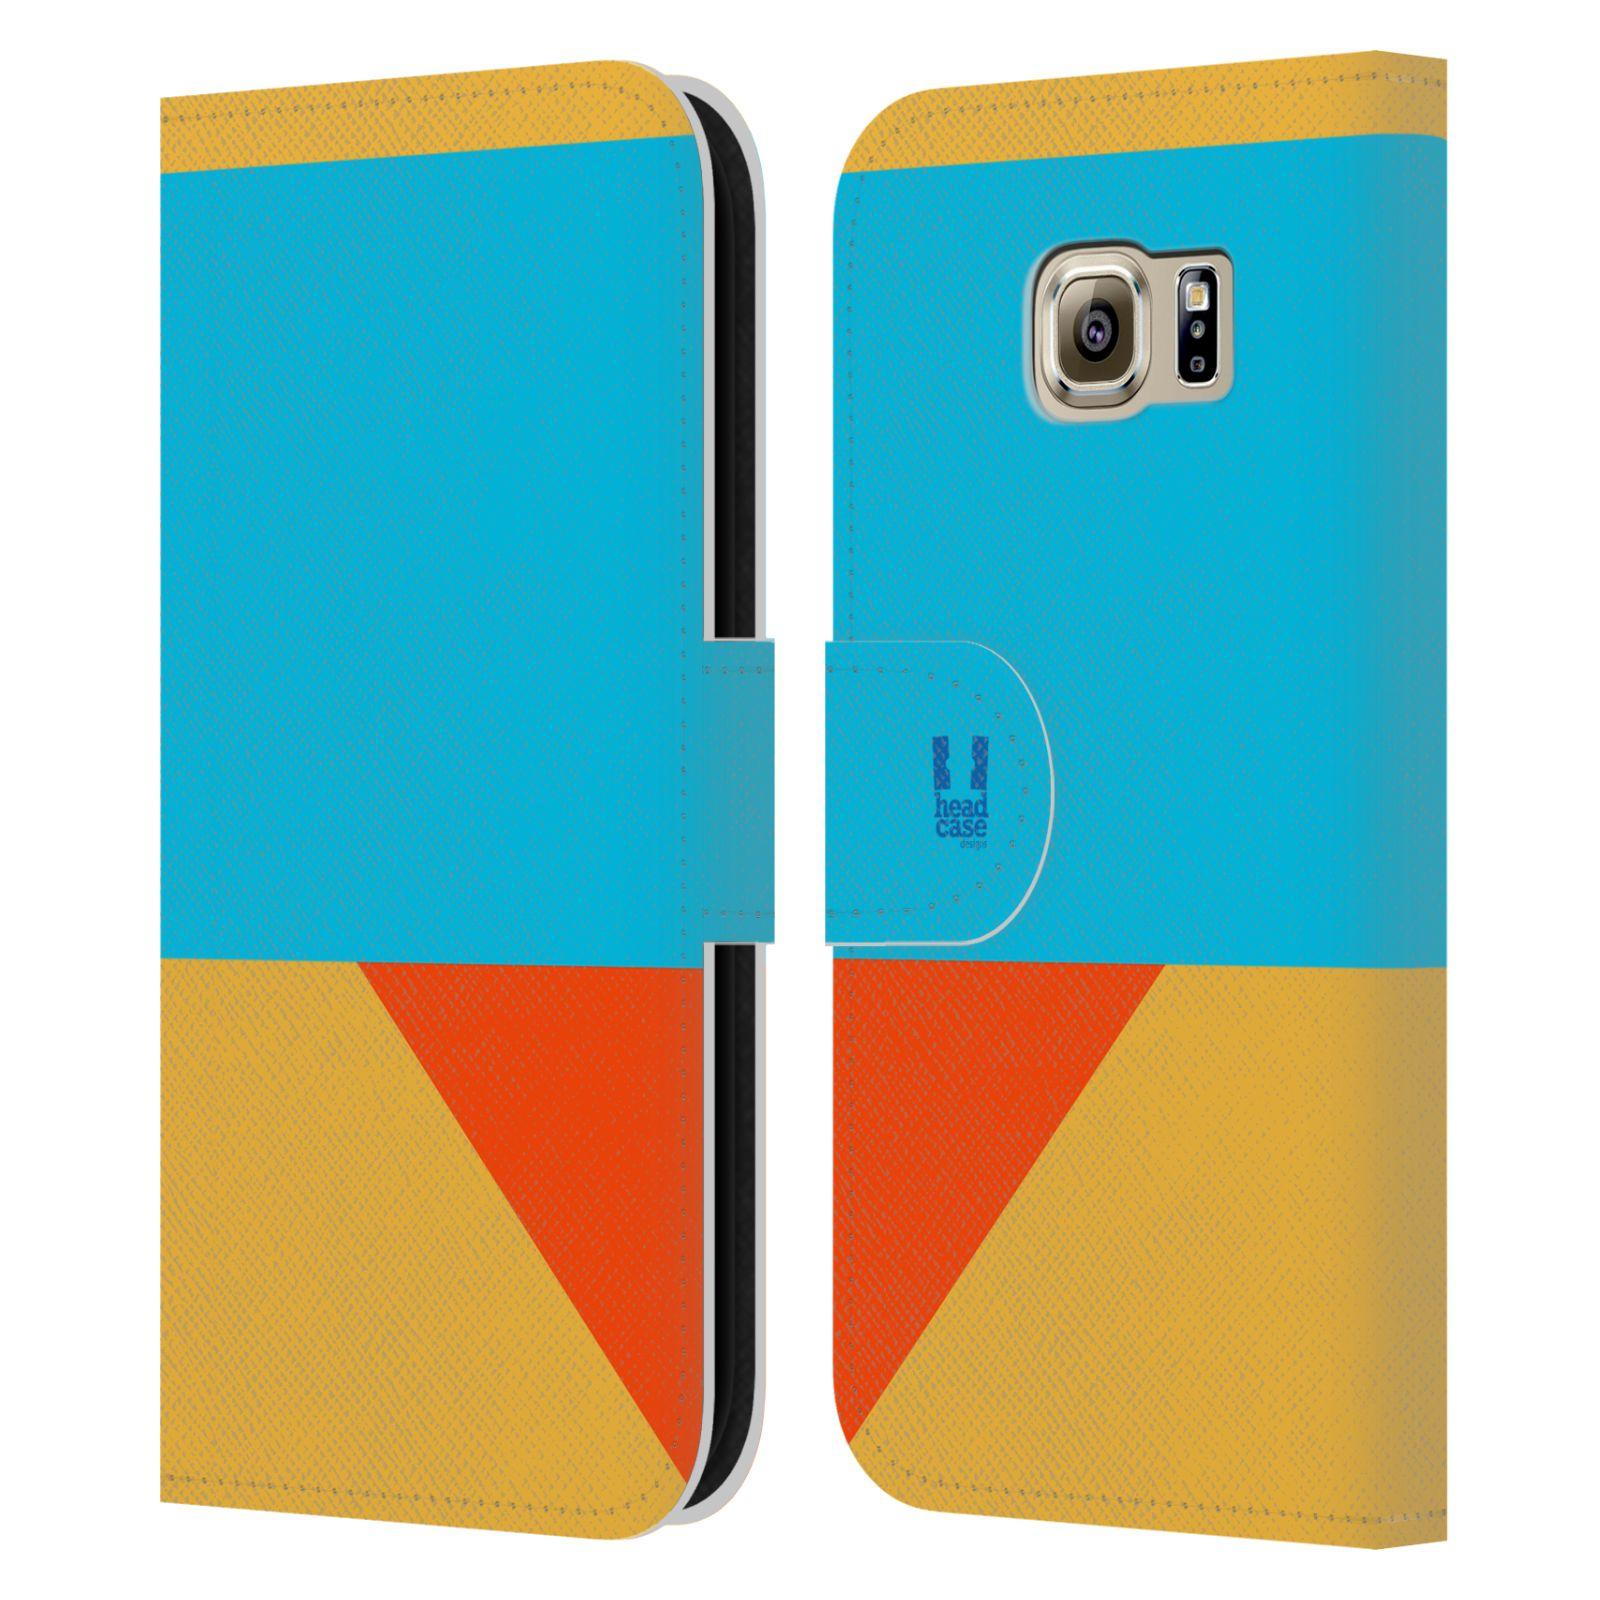 HEAD CASE Flipové pouzdro pro mobil Samsung Galaxy S6 barevné tvary béžová a modrá DAY WEAR